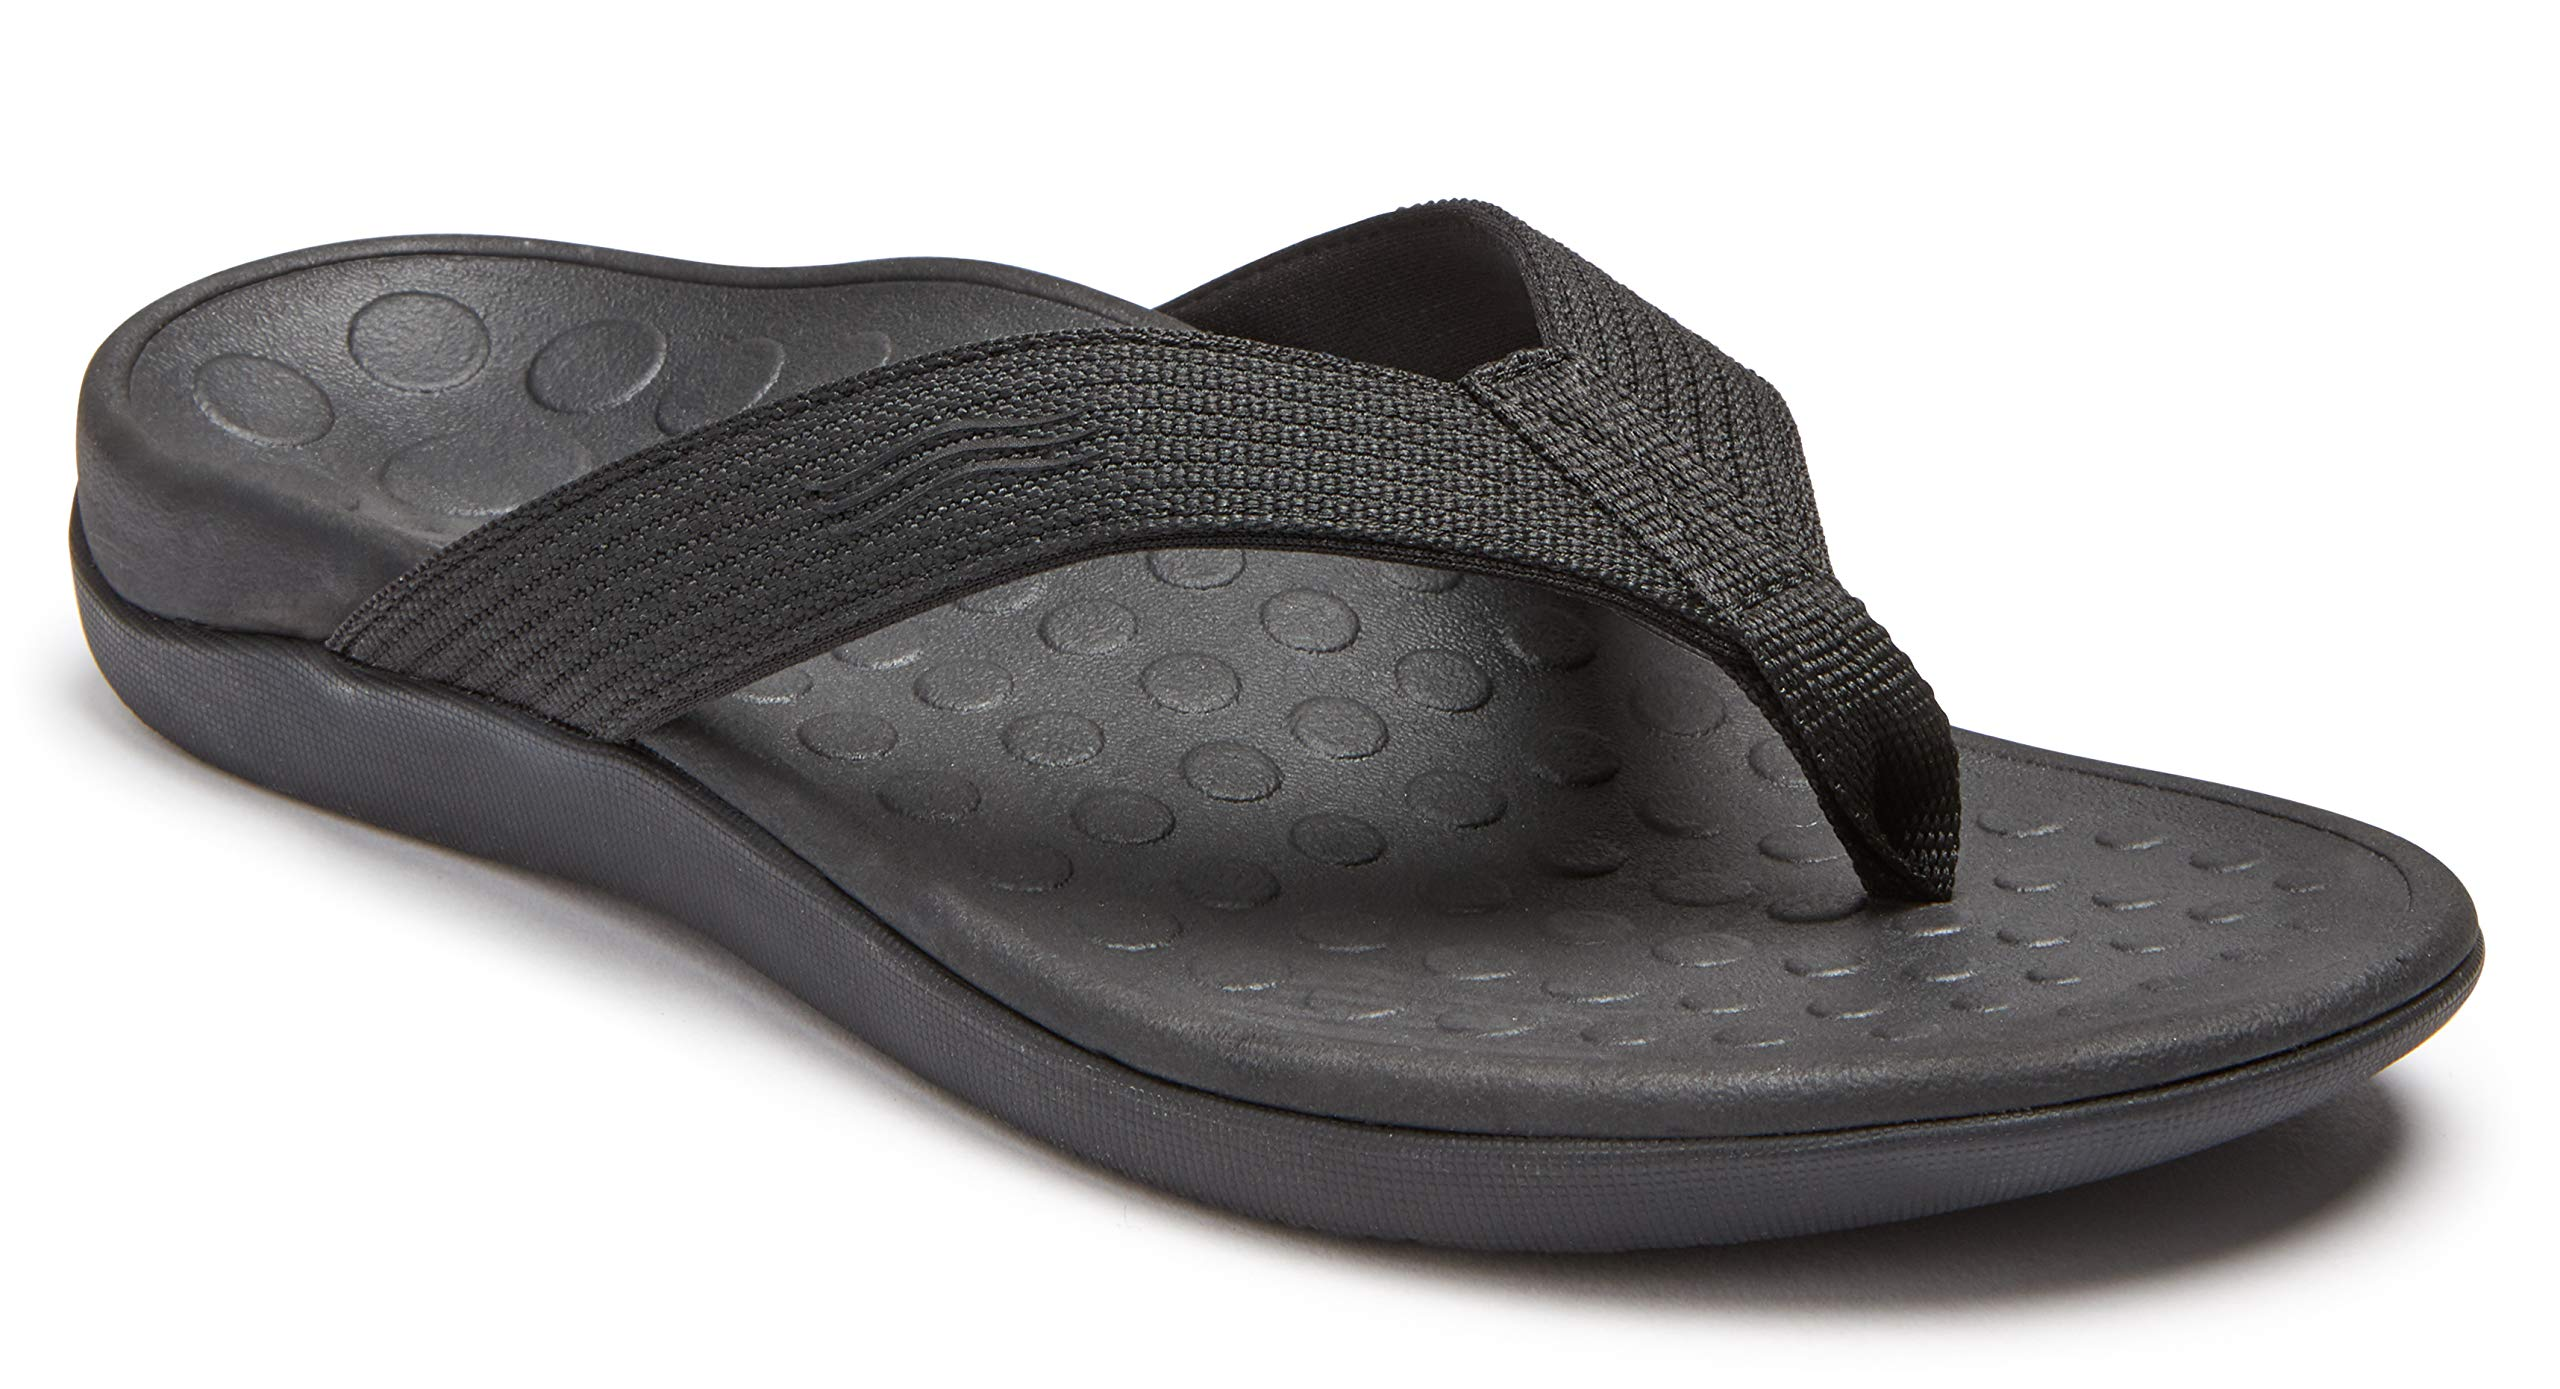 Vionic Unisex Wave Toe-Post Sandal - Flip-Flop with Concealed Orthotic Arch Support Black/Black Men's 8 M US/Women's 9 M US